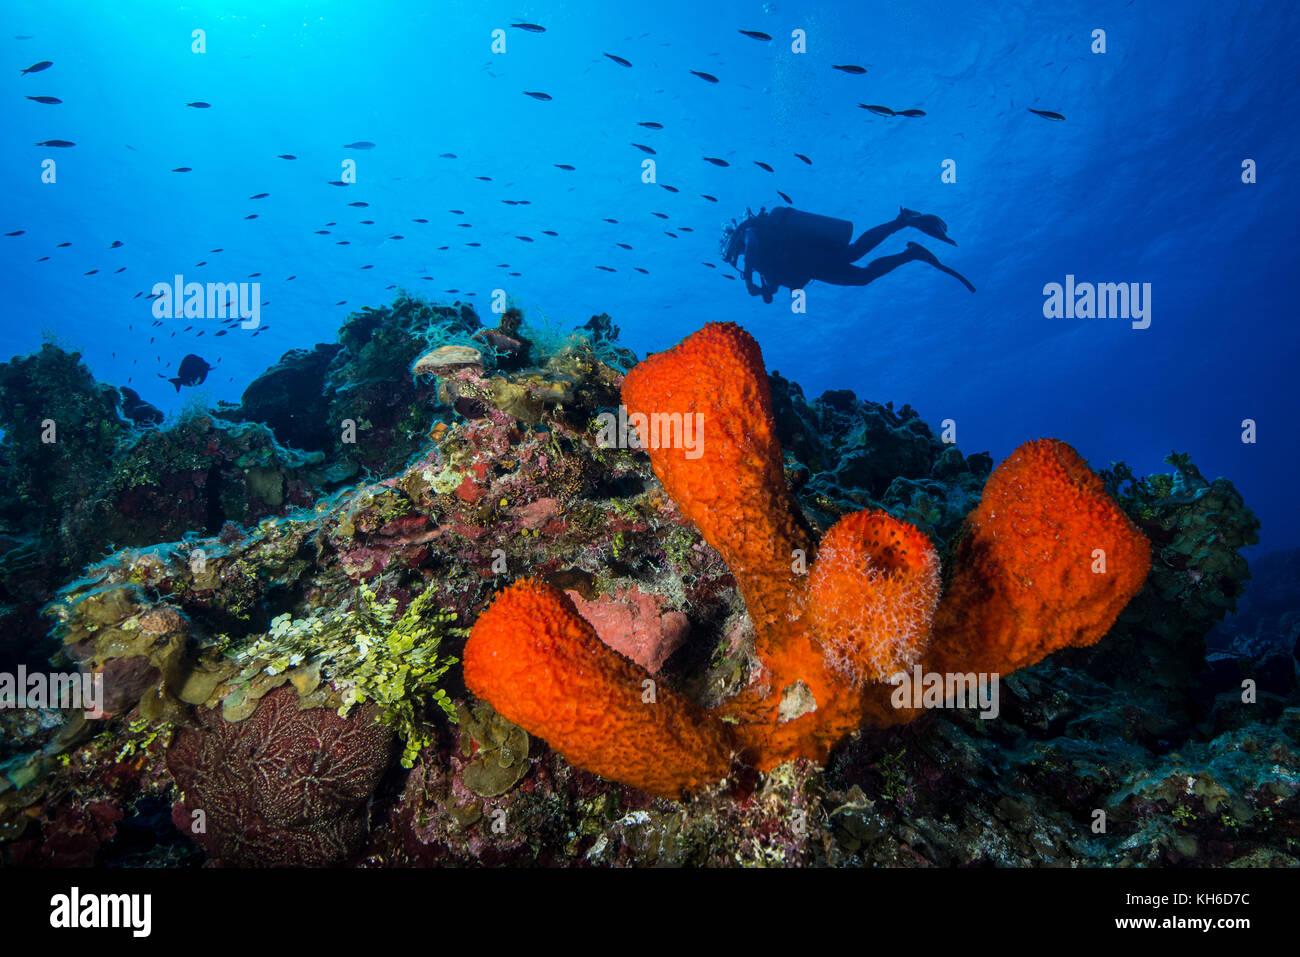 Marine sponge stock photos marine sponge stock images alamy underwater seascape marine sponge and scuba diver at little cayman stock image reviewsmspy